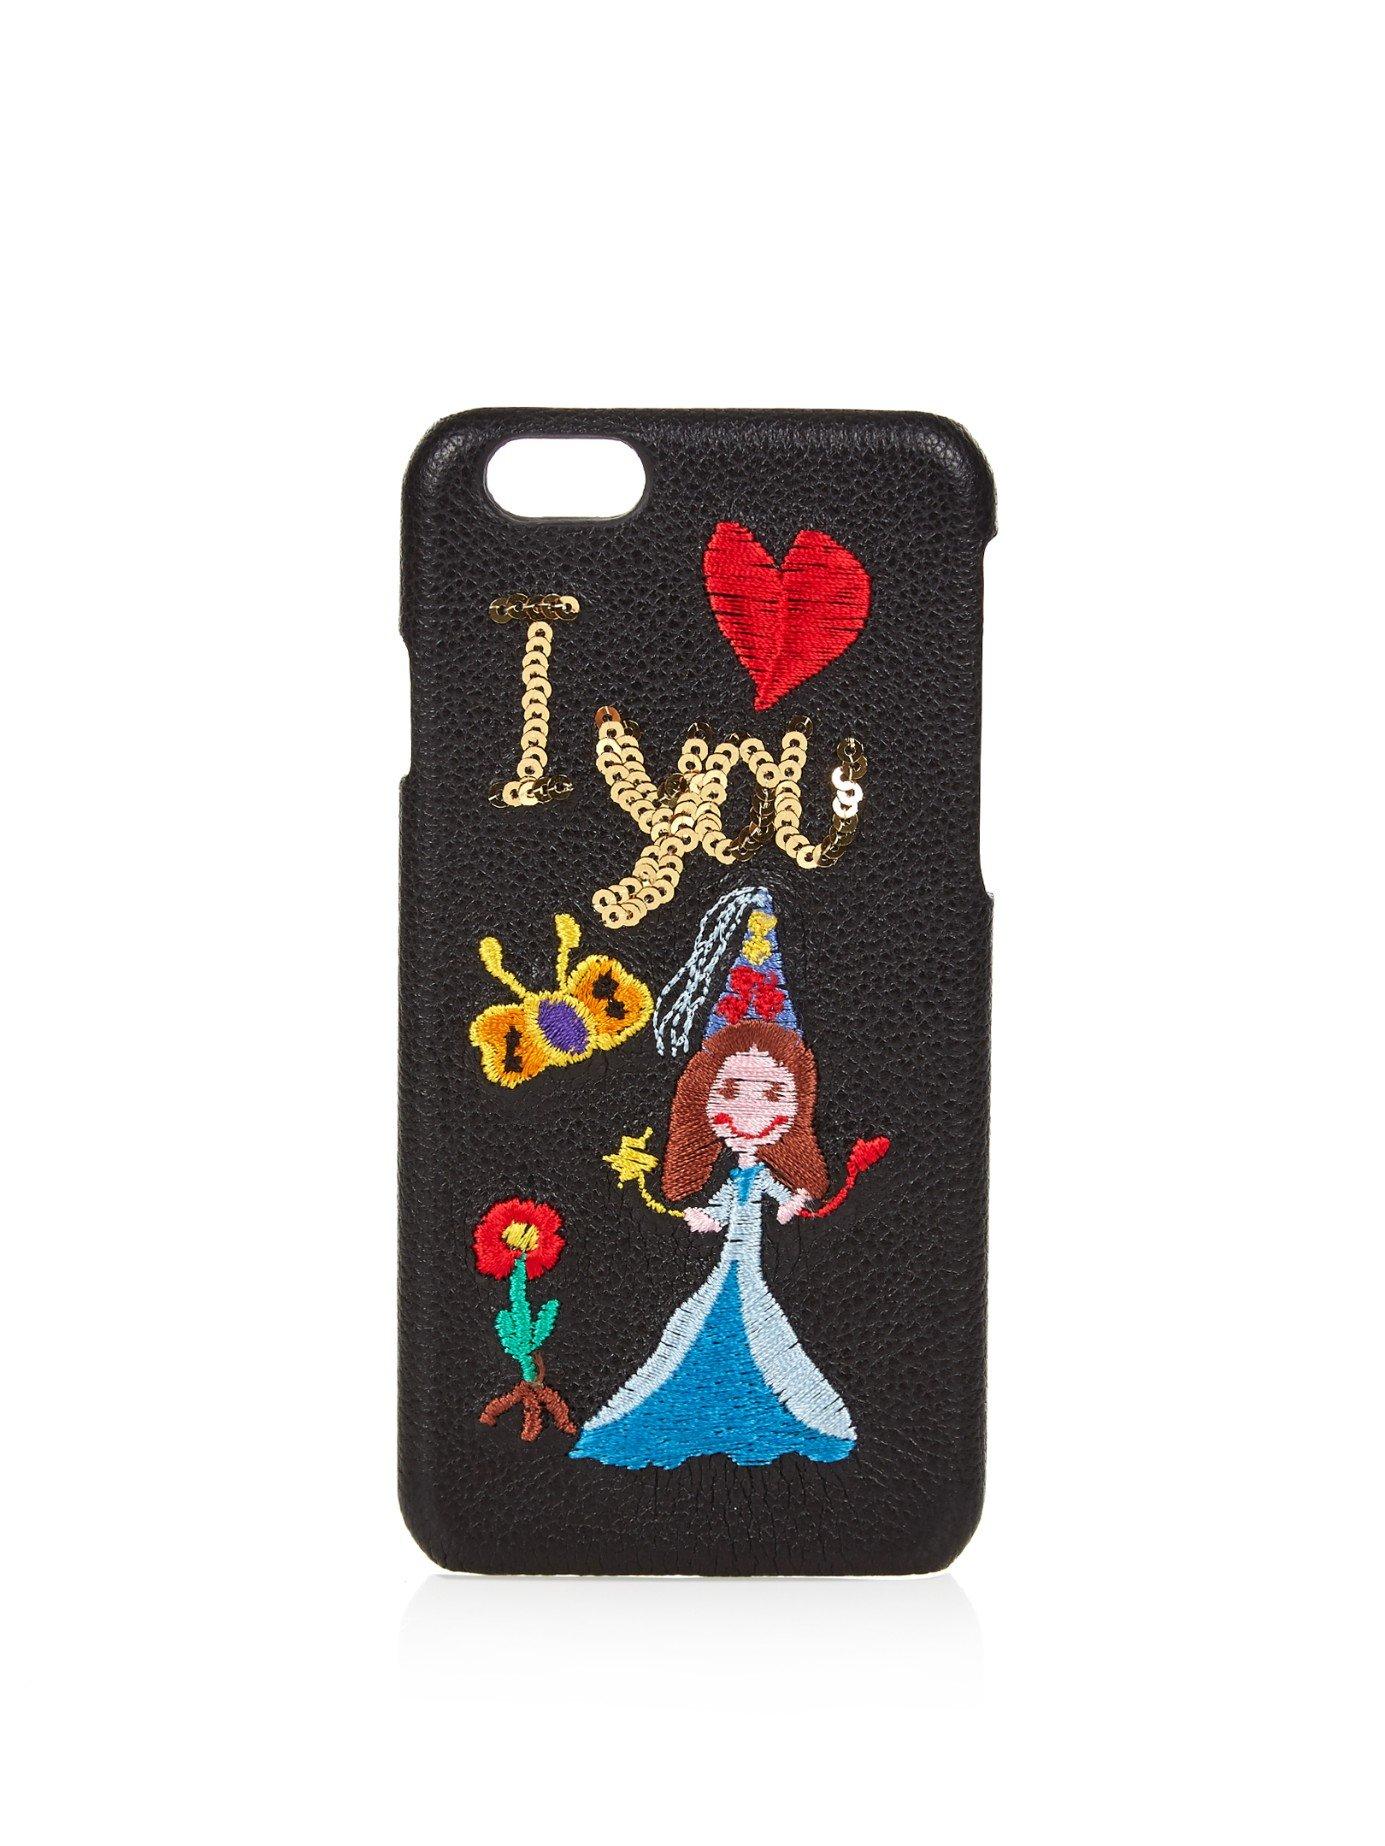 Pendleton Iphone Case